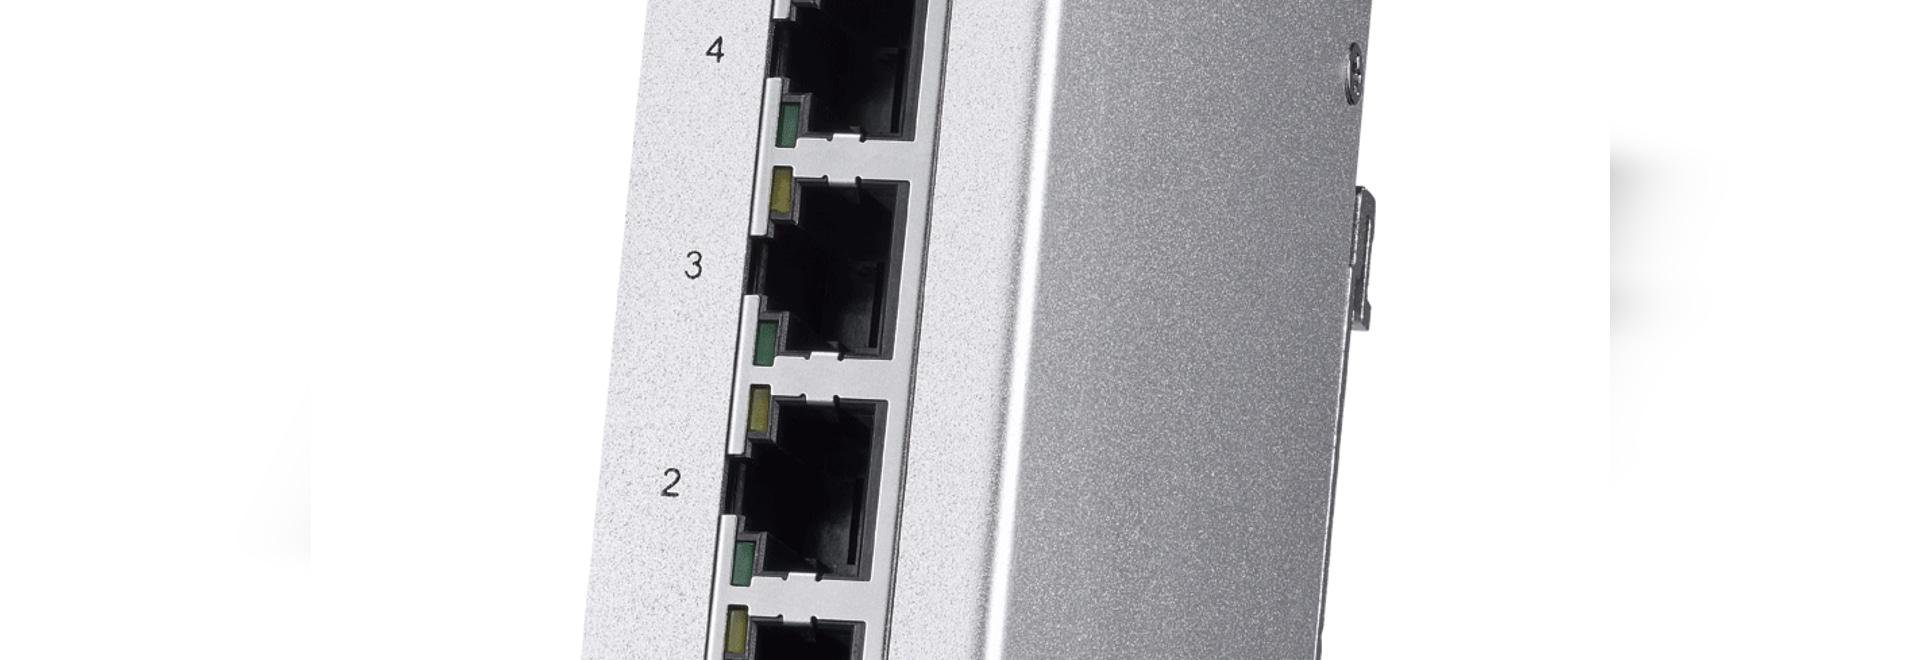 JetNet 3205GP/JetNet 3205GP-1F